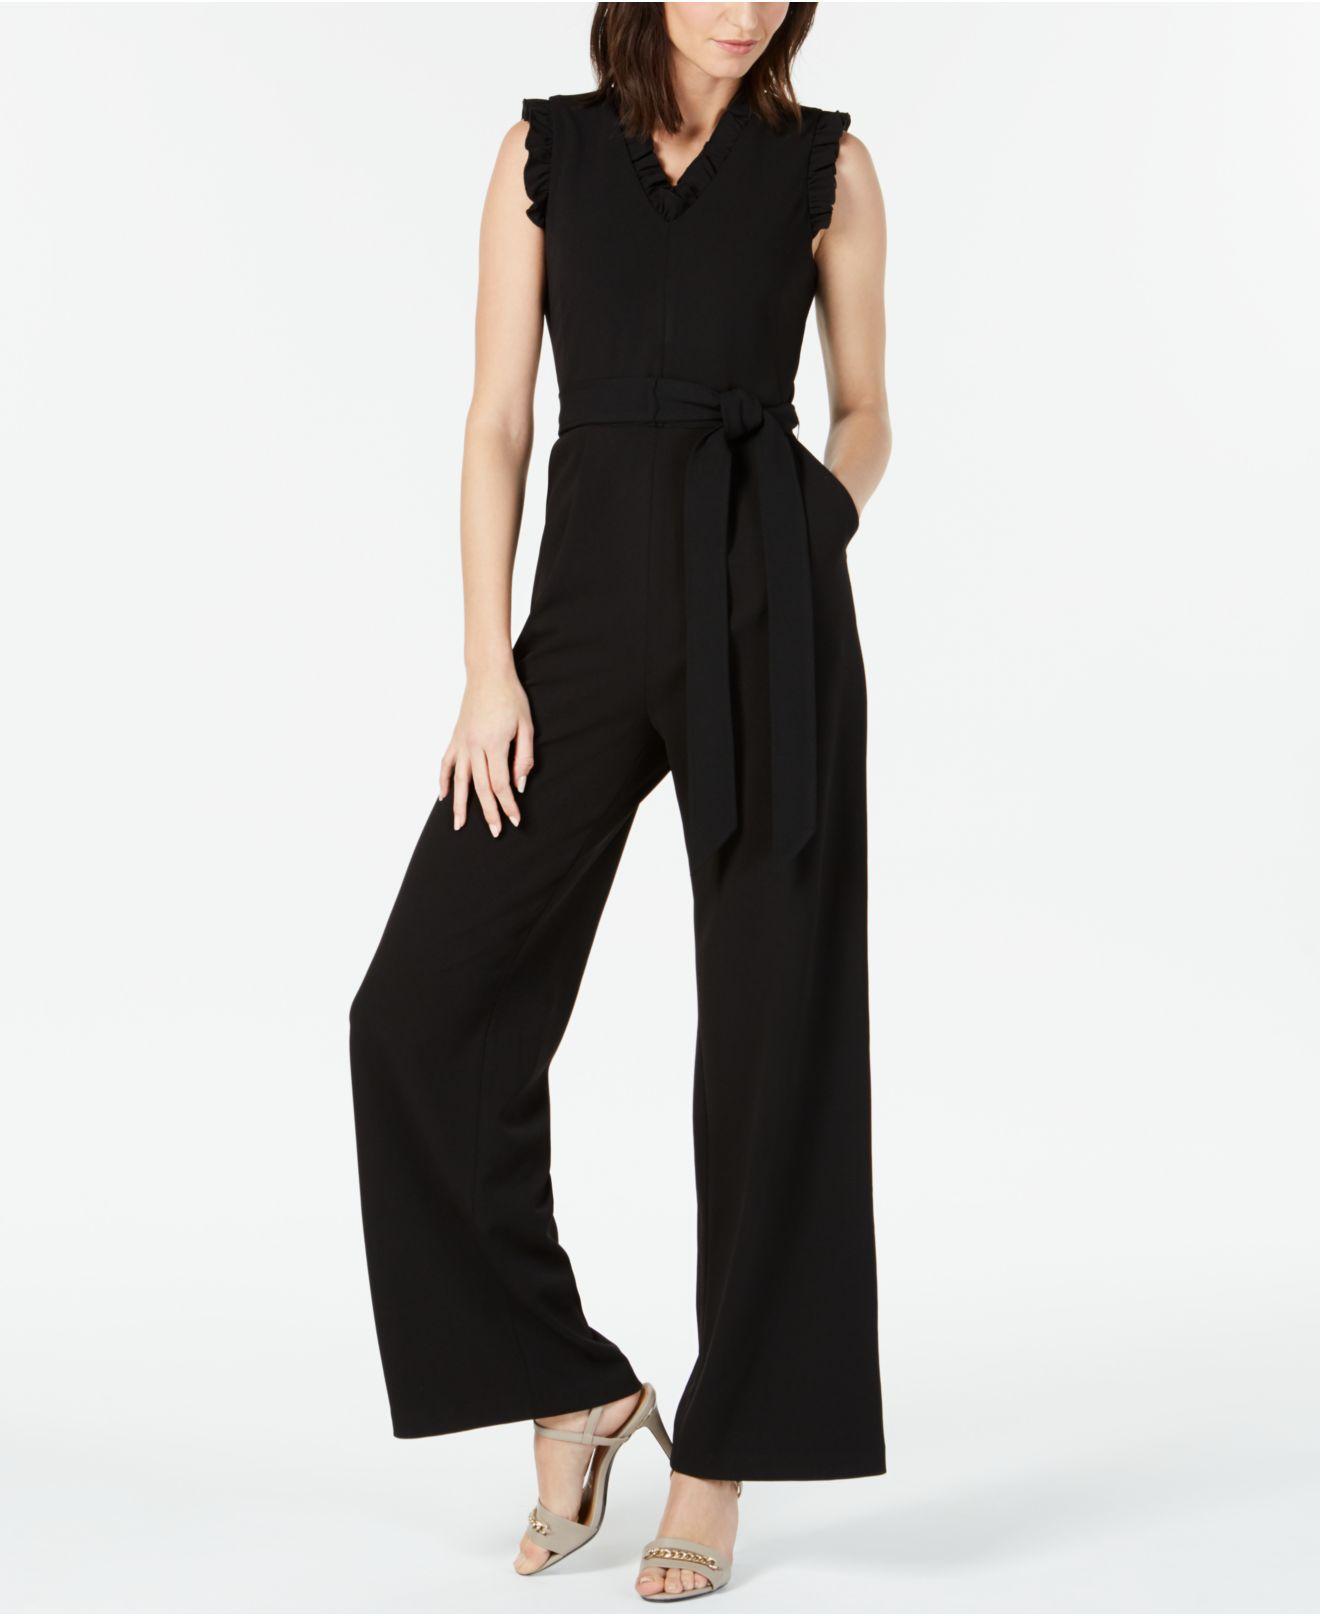 592b910933a Lyst - Calvin Klein Sleeveless Ruffled Wide-leg Jumpsuit in Black